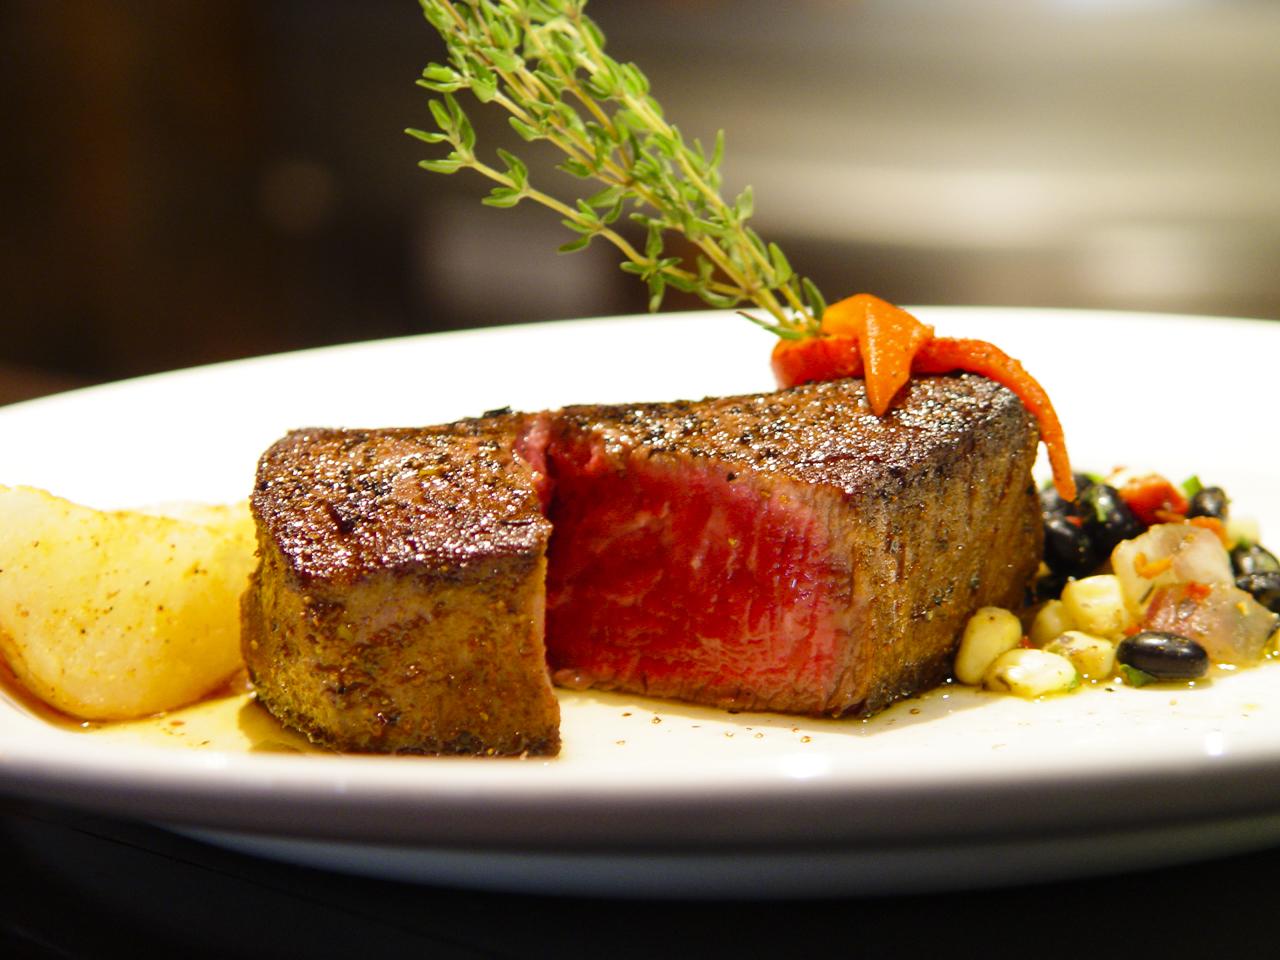 Paulie Spice for Steak